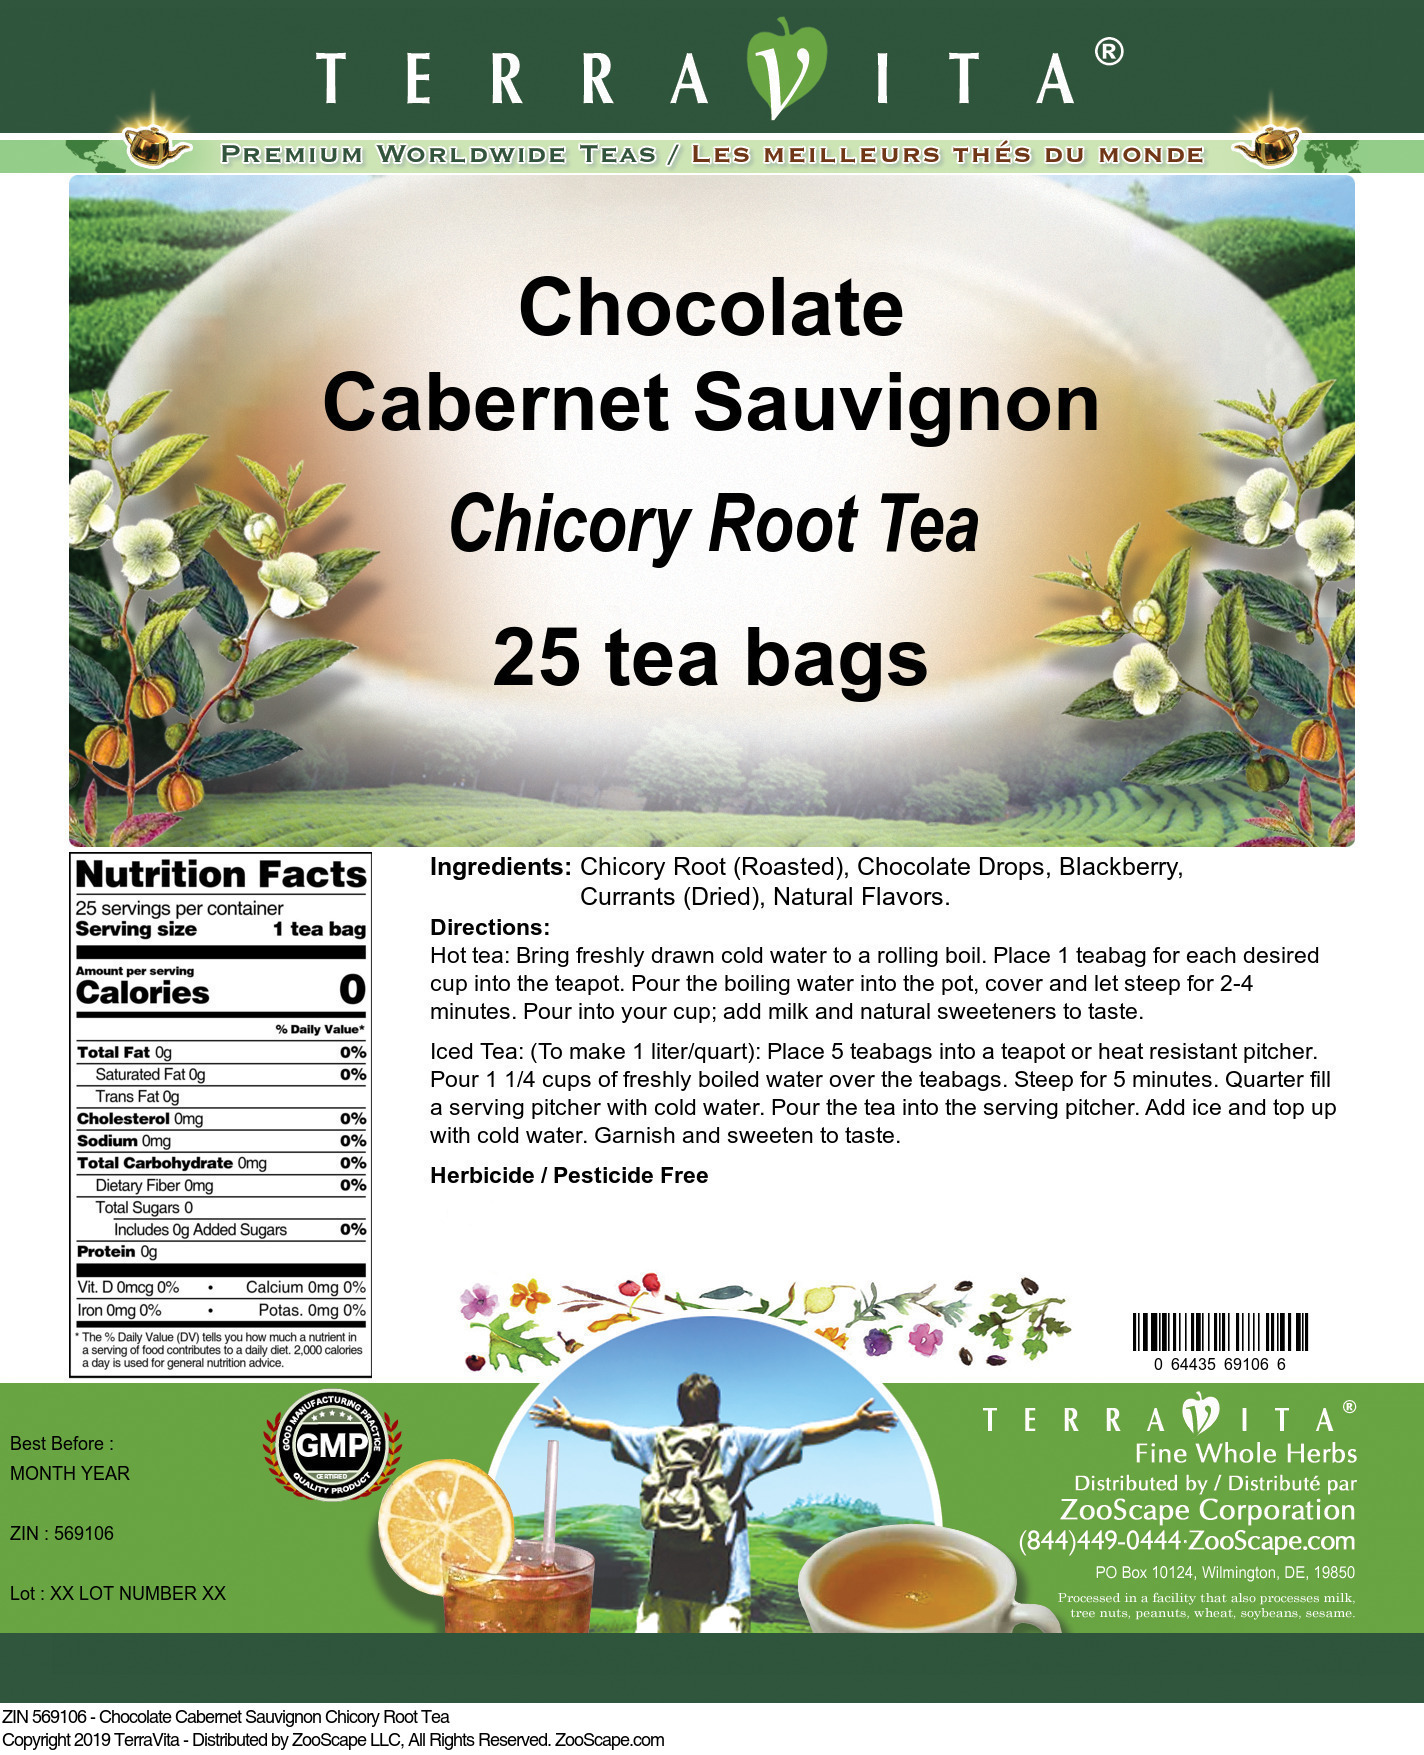 Chocolate Cabernet Sauvignon Chicory Root